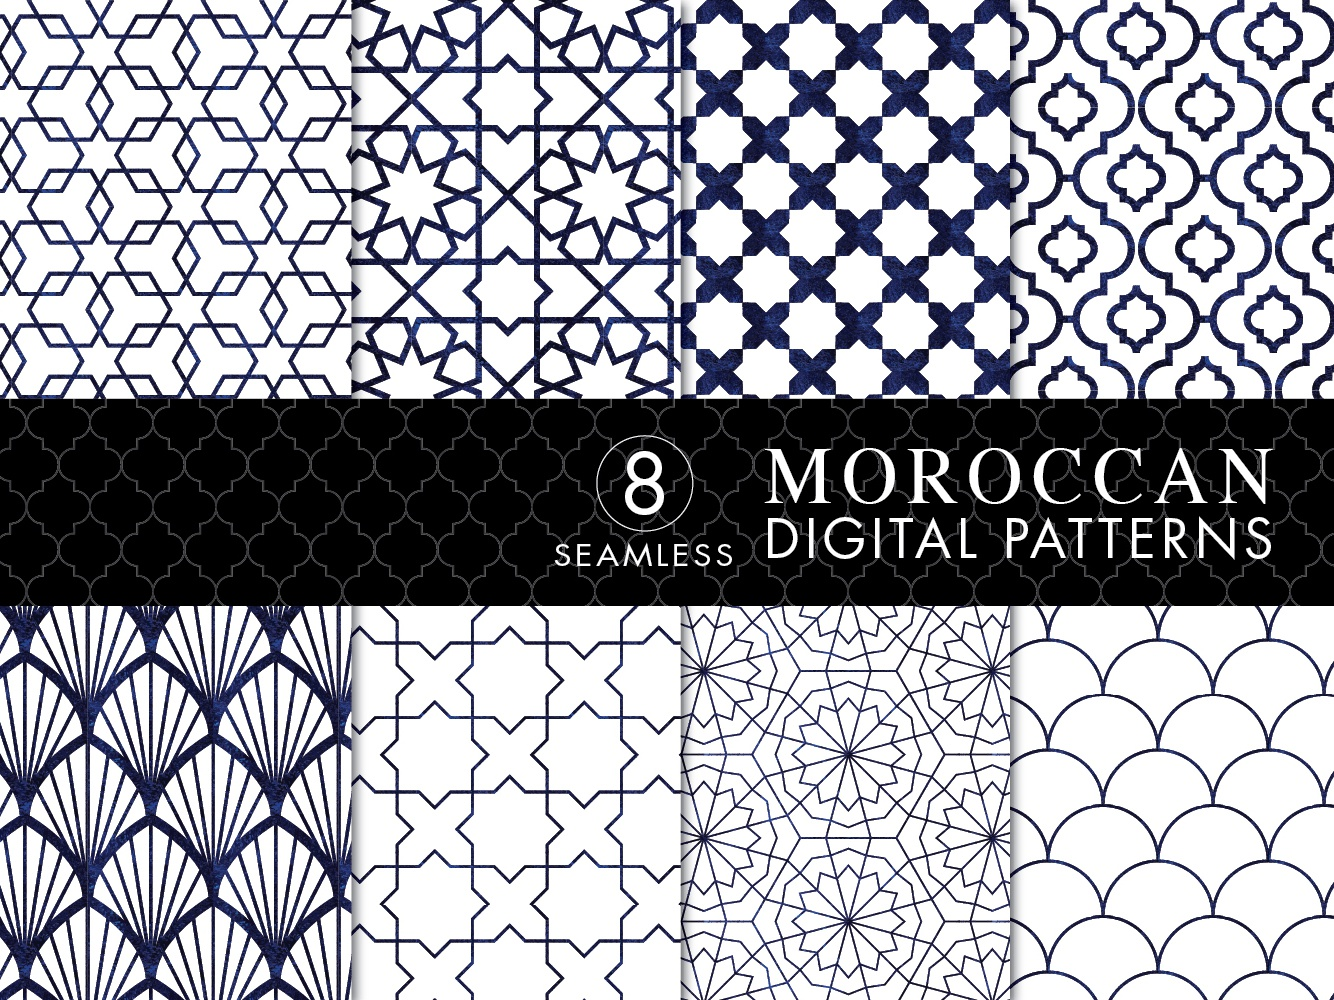 8 Seamless Moroccan Patterns - White & Blue Watercolor Set 1